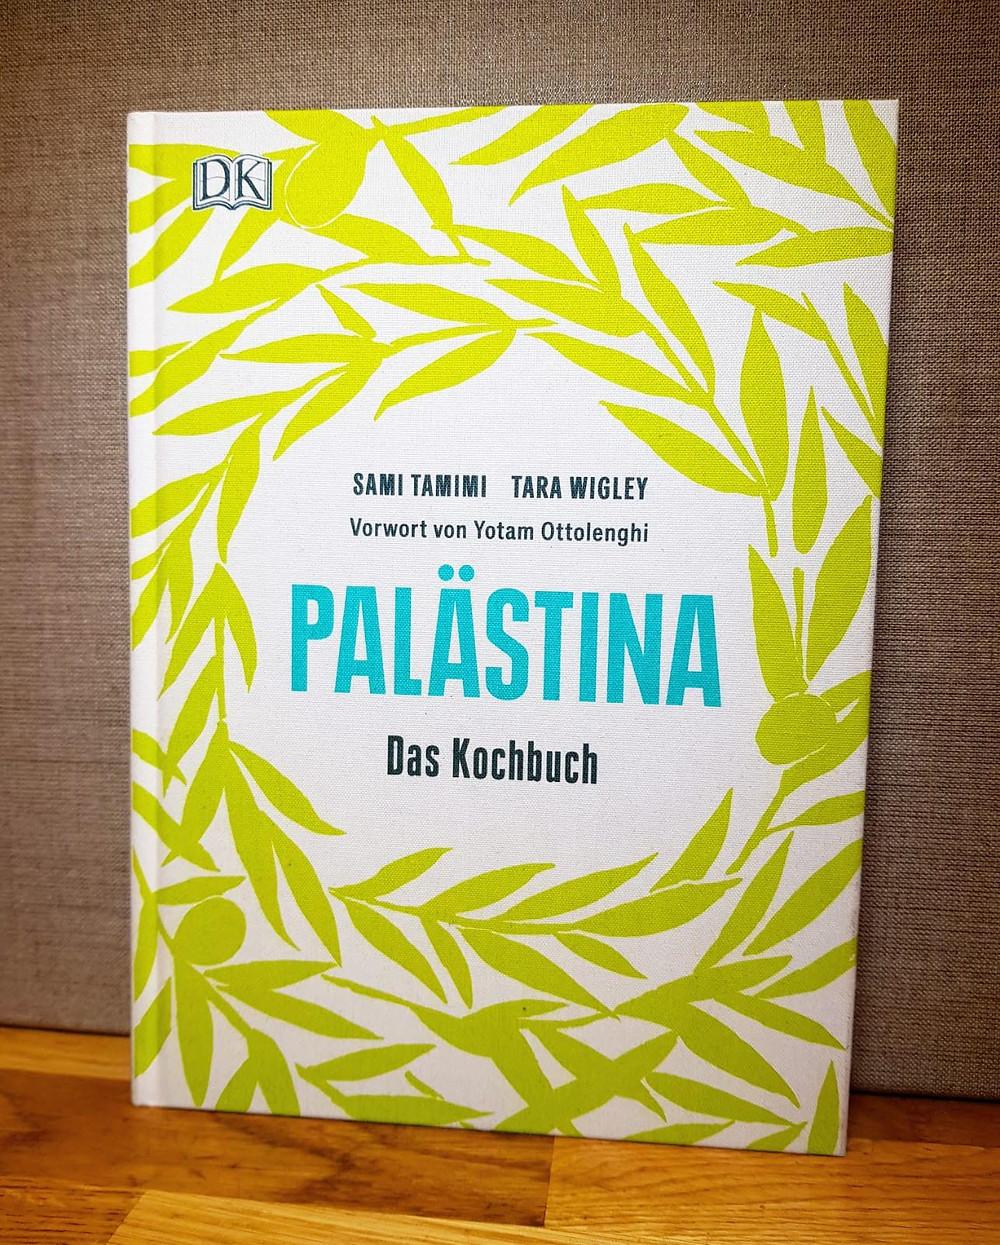 """Palästina das Kochbuch"" von Sami Tamimi und Tara Wigley"